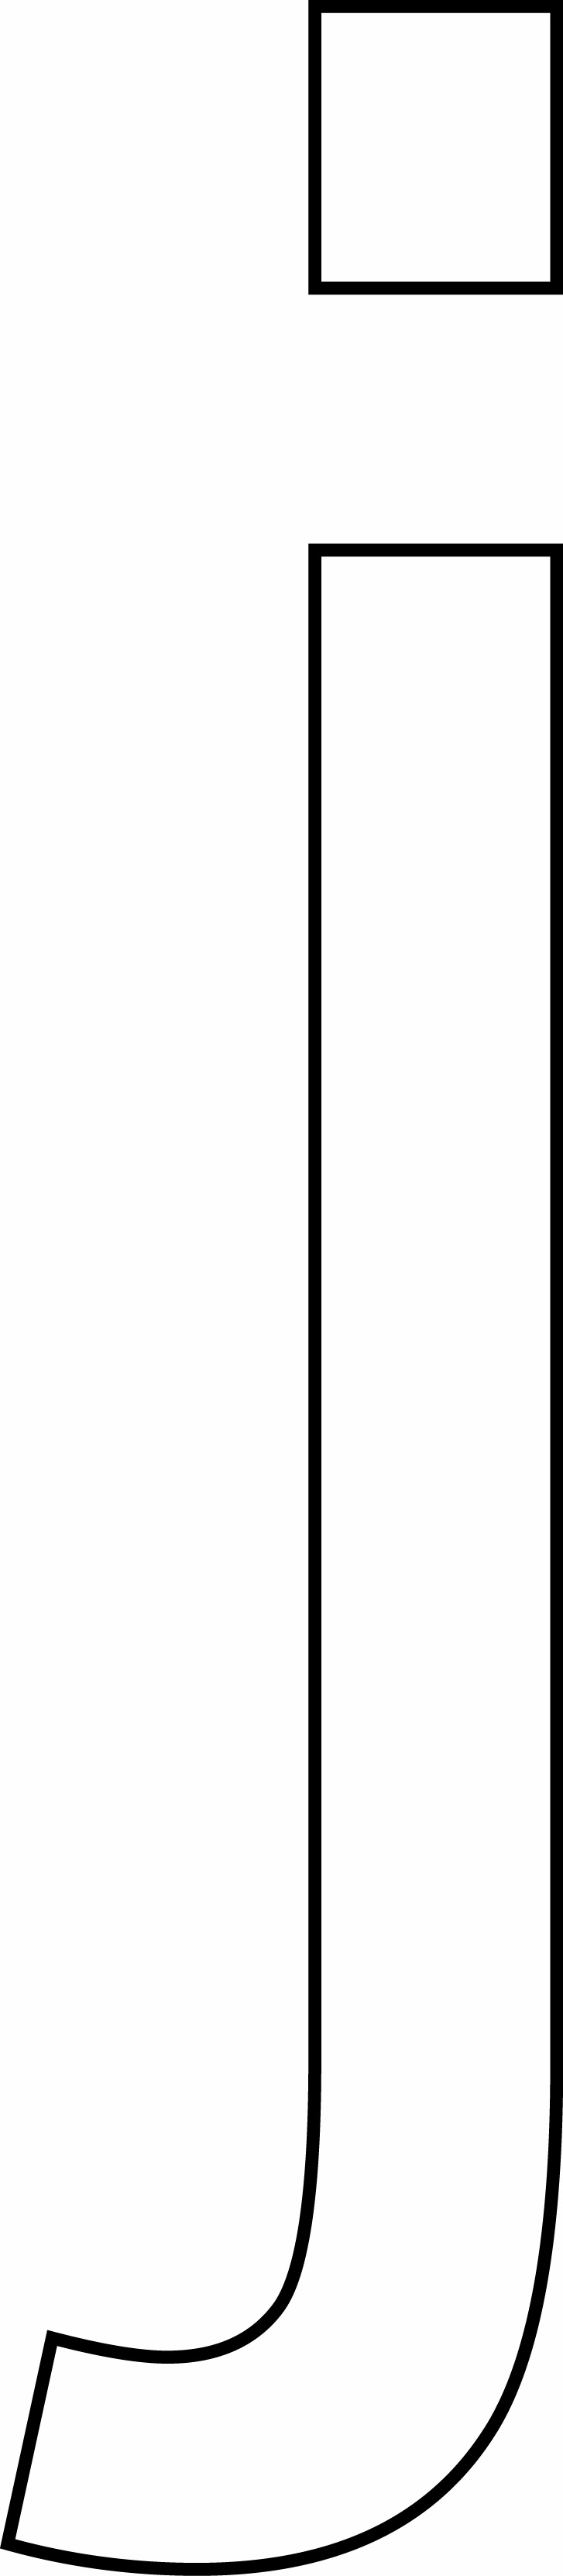 Letra J - minúscula para imprimir